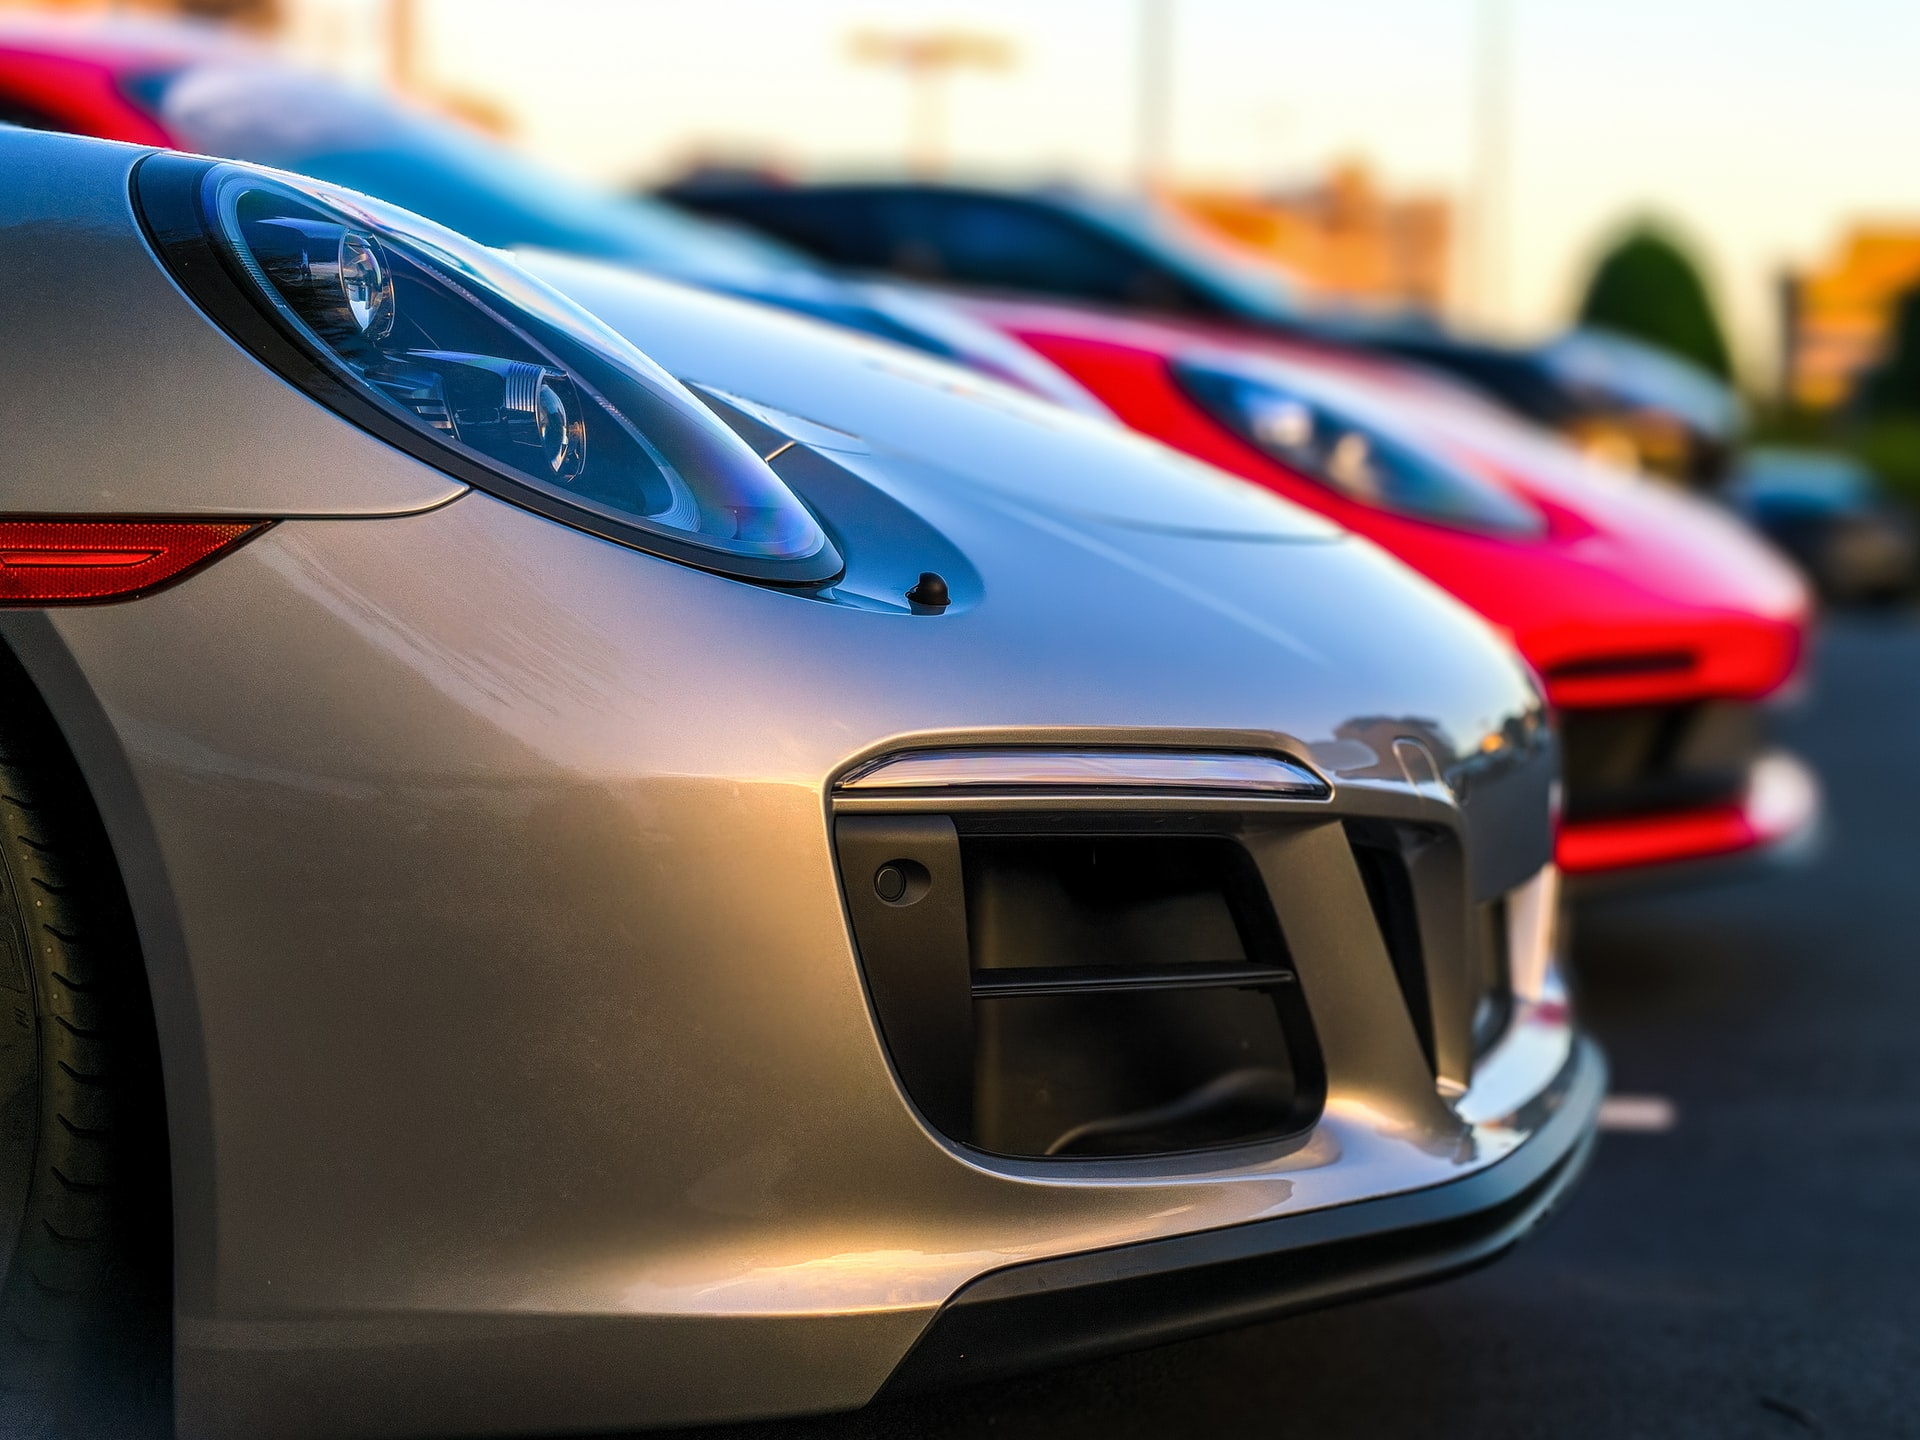 Luxury Sports Car Rental Ferrari, Porsche ⋆ Luxury and Sports Cars Hire